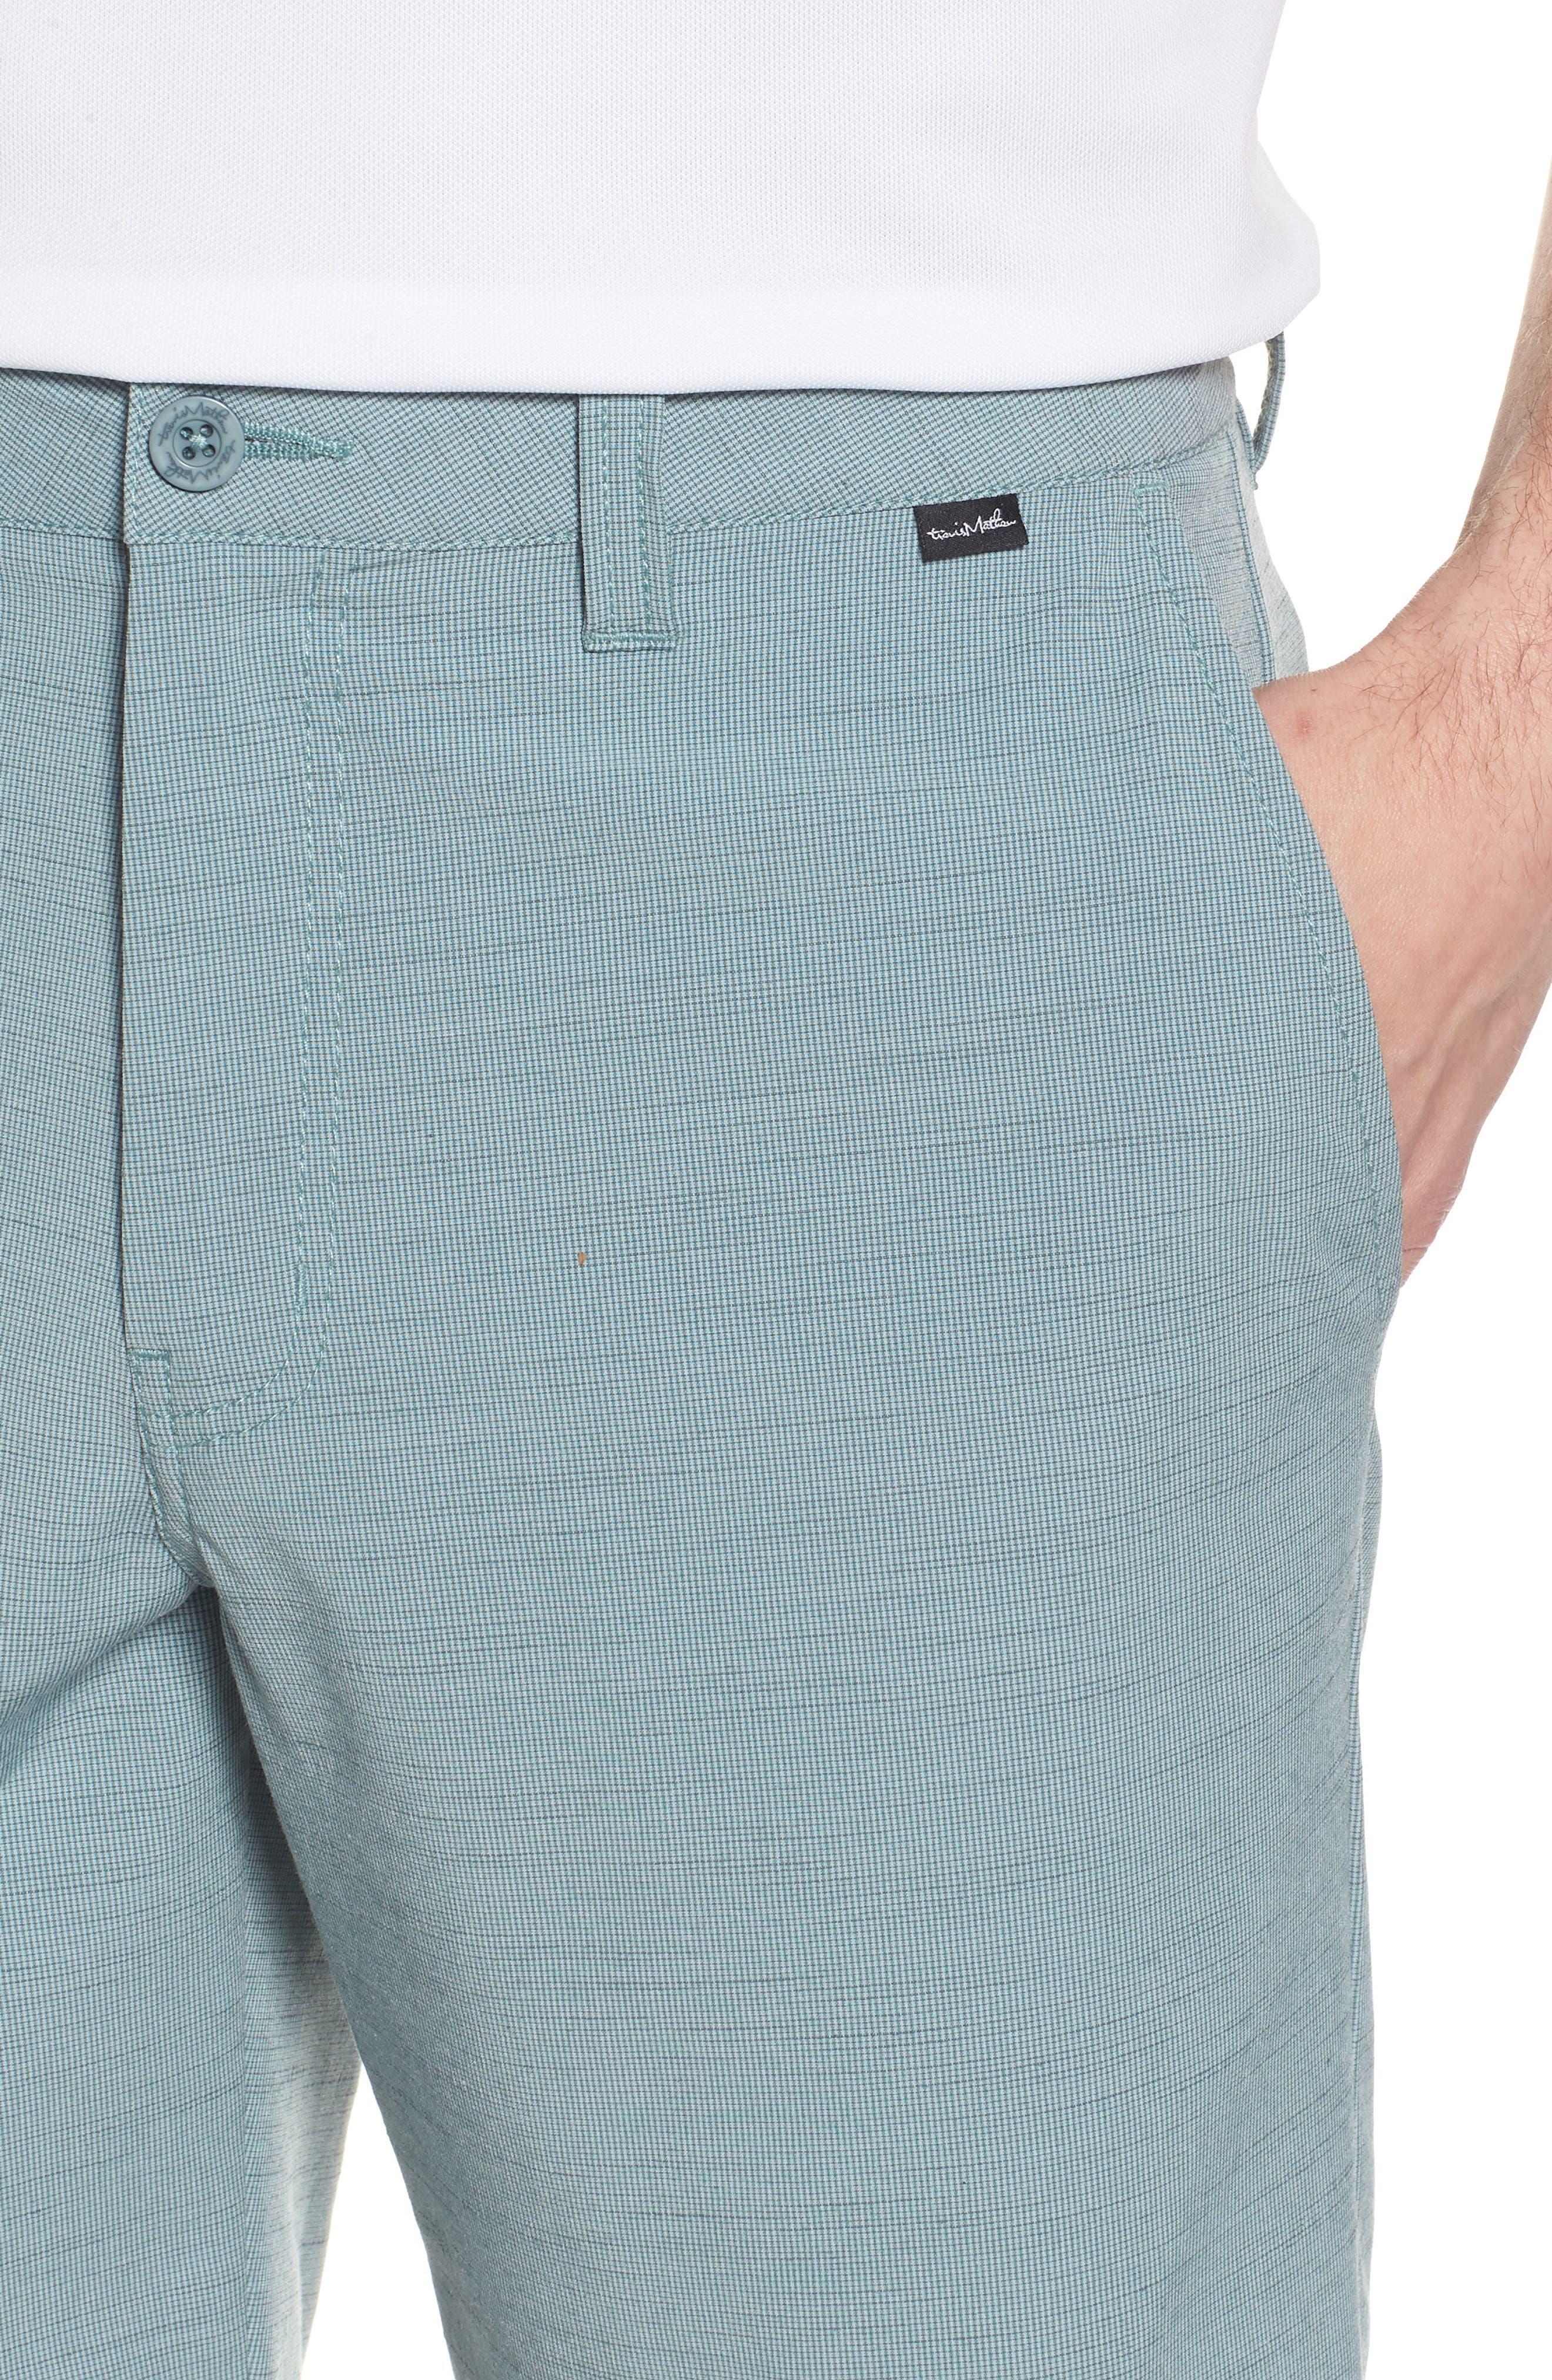 Tulum Stretch Shorts,                             Alternate thumbnail 4, color,                             300